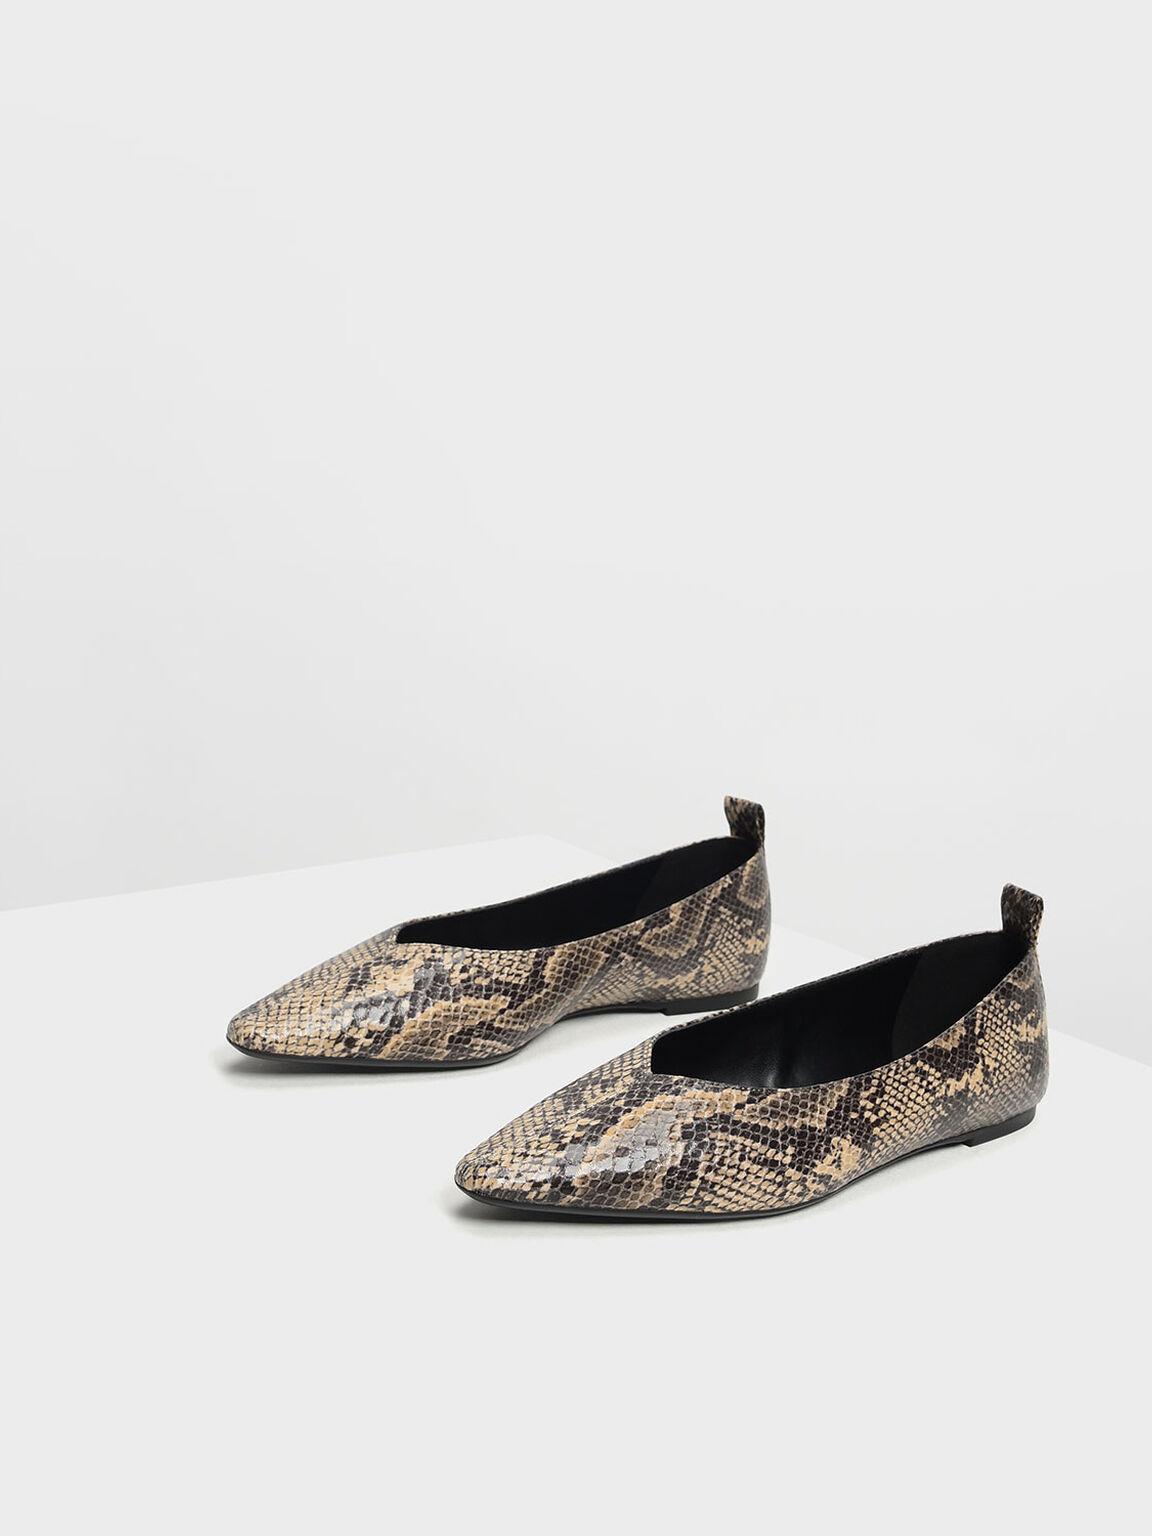 Snake Print Ballerinas, Sand, hi-res